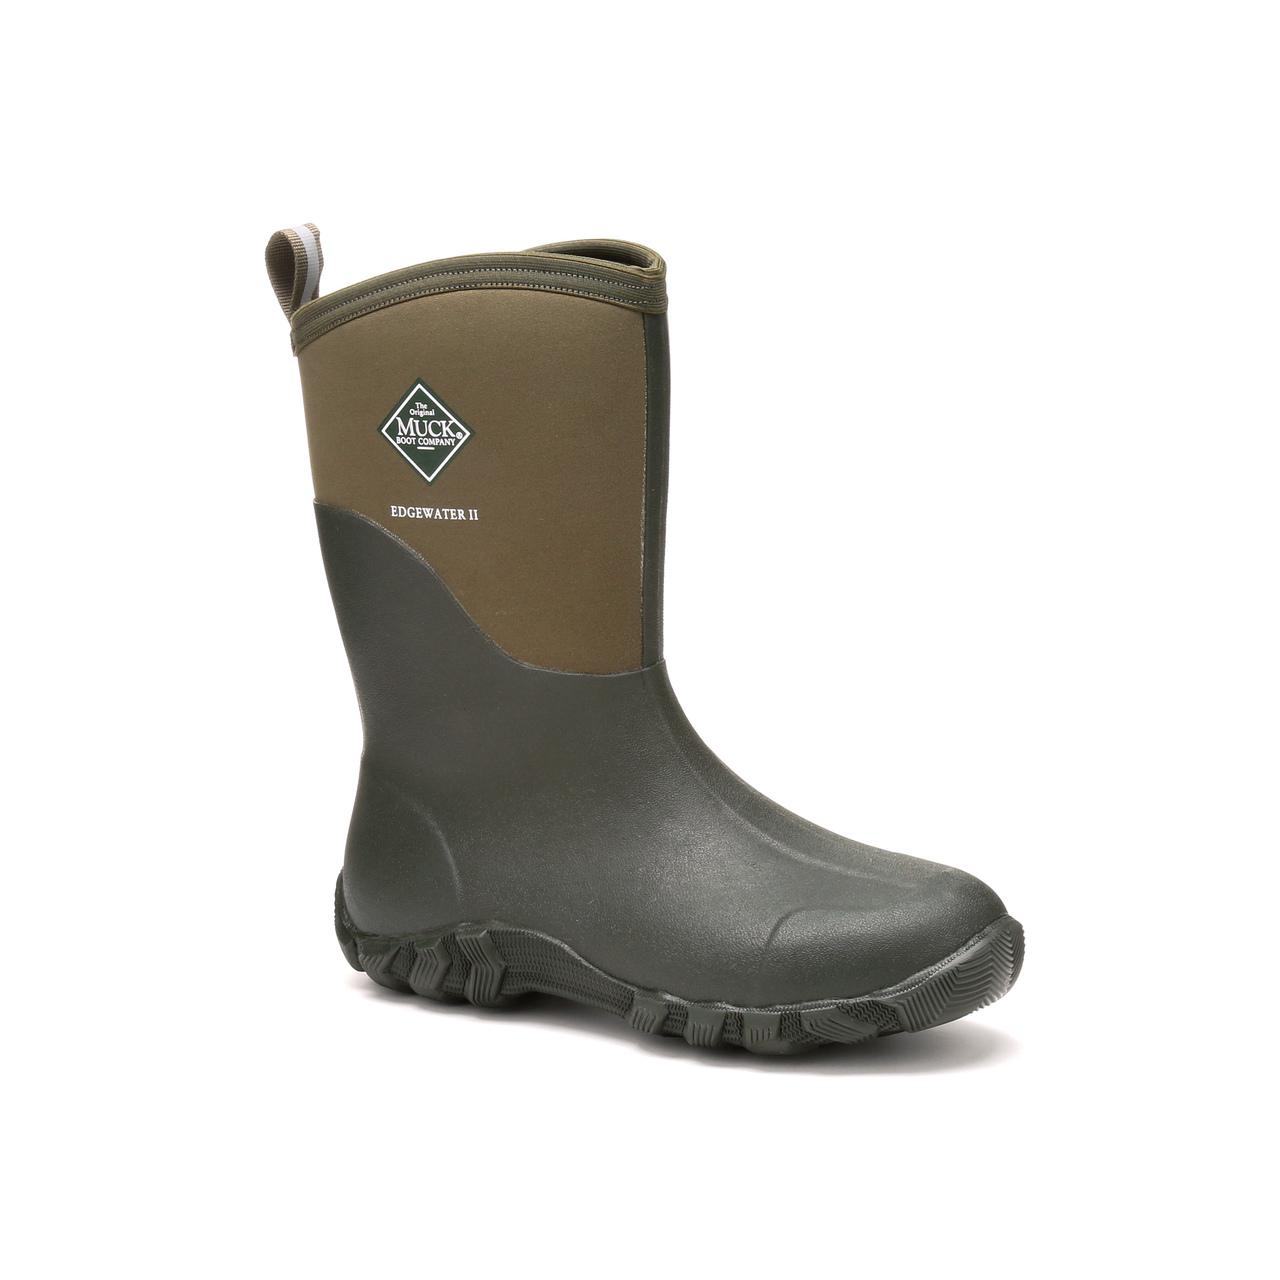 Waterproof Fishing Boots | Muck Wetland Boots | Muck Boots USA